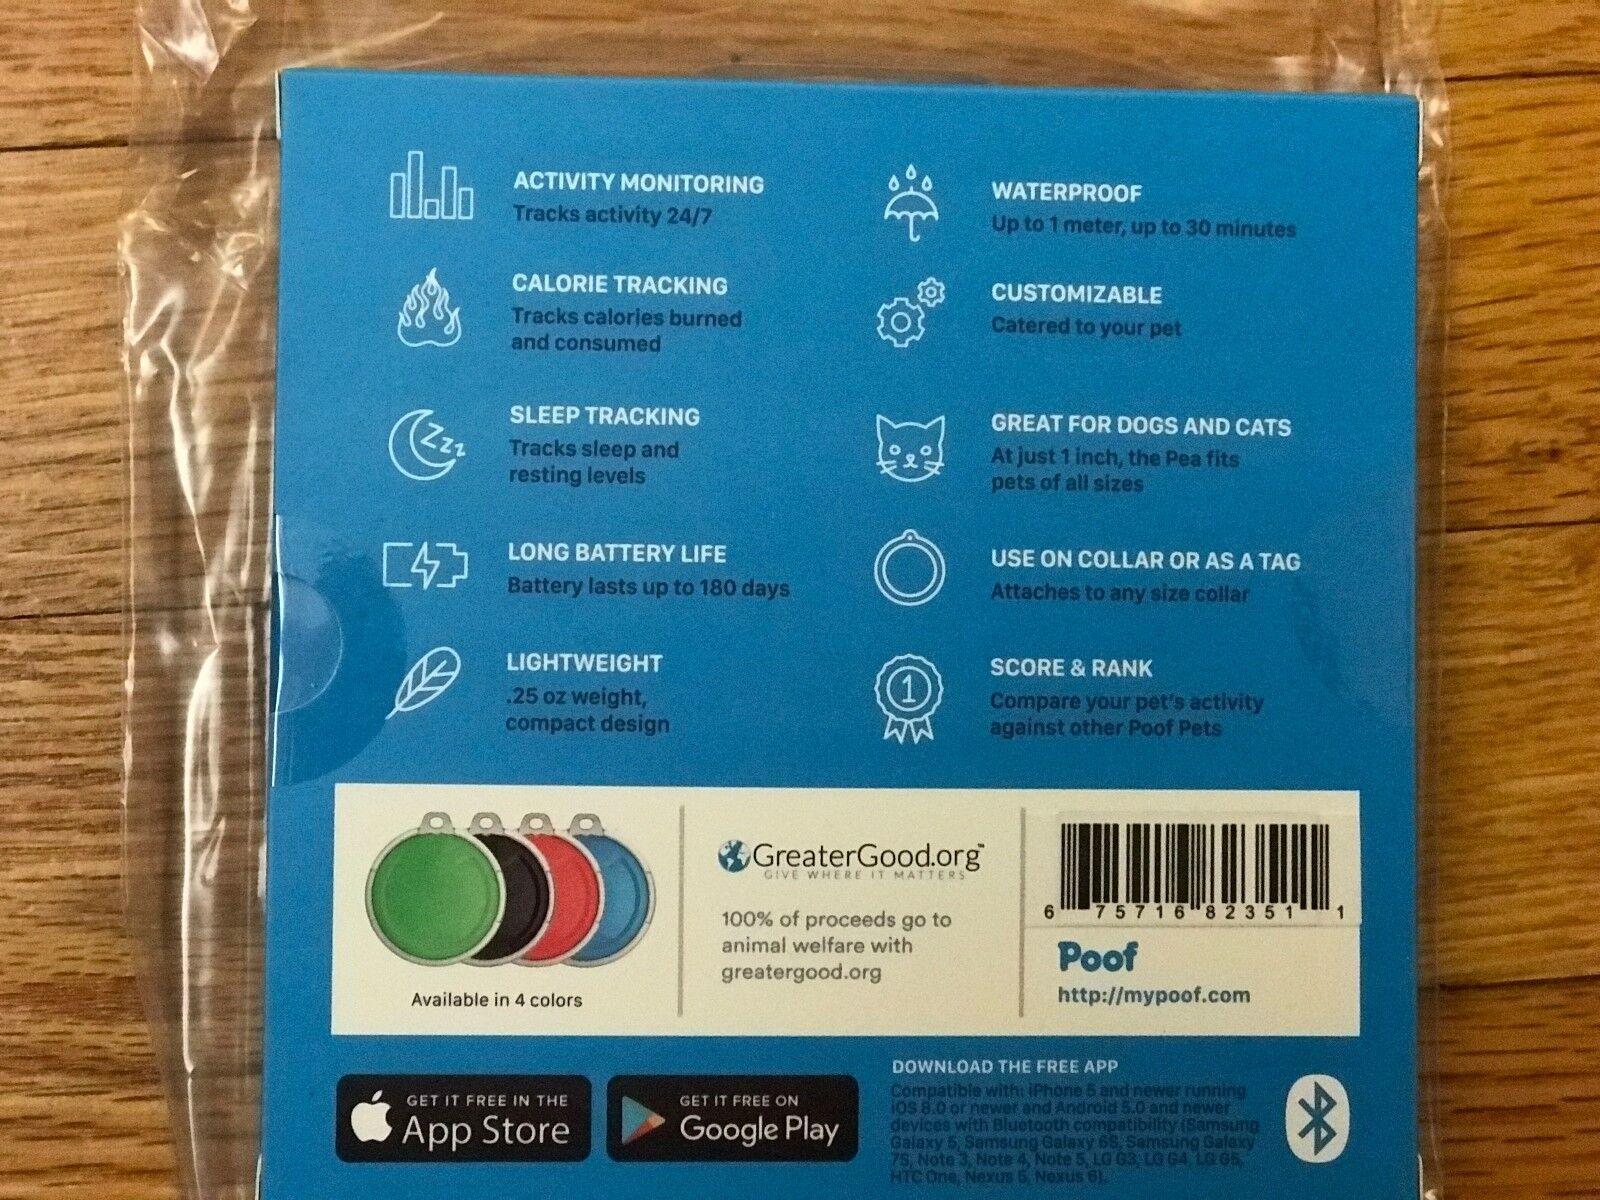 Poof Pea Activity Tracker, Blue, Cat/dog, Monitors Sleep And Activity, New - $29.99